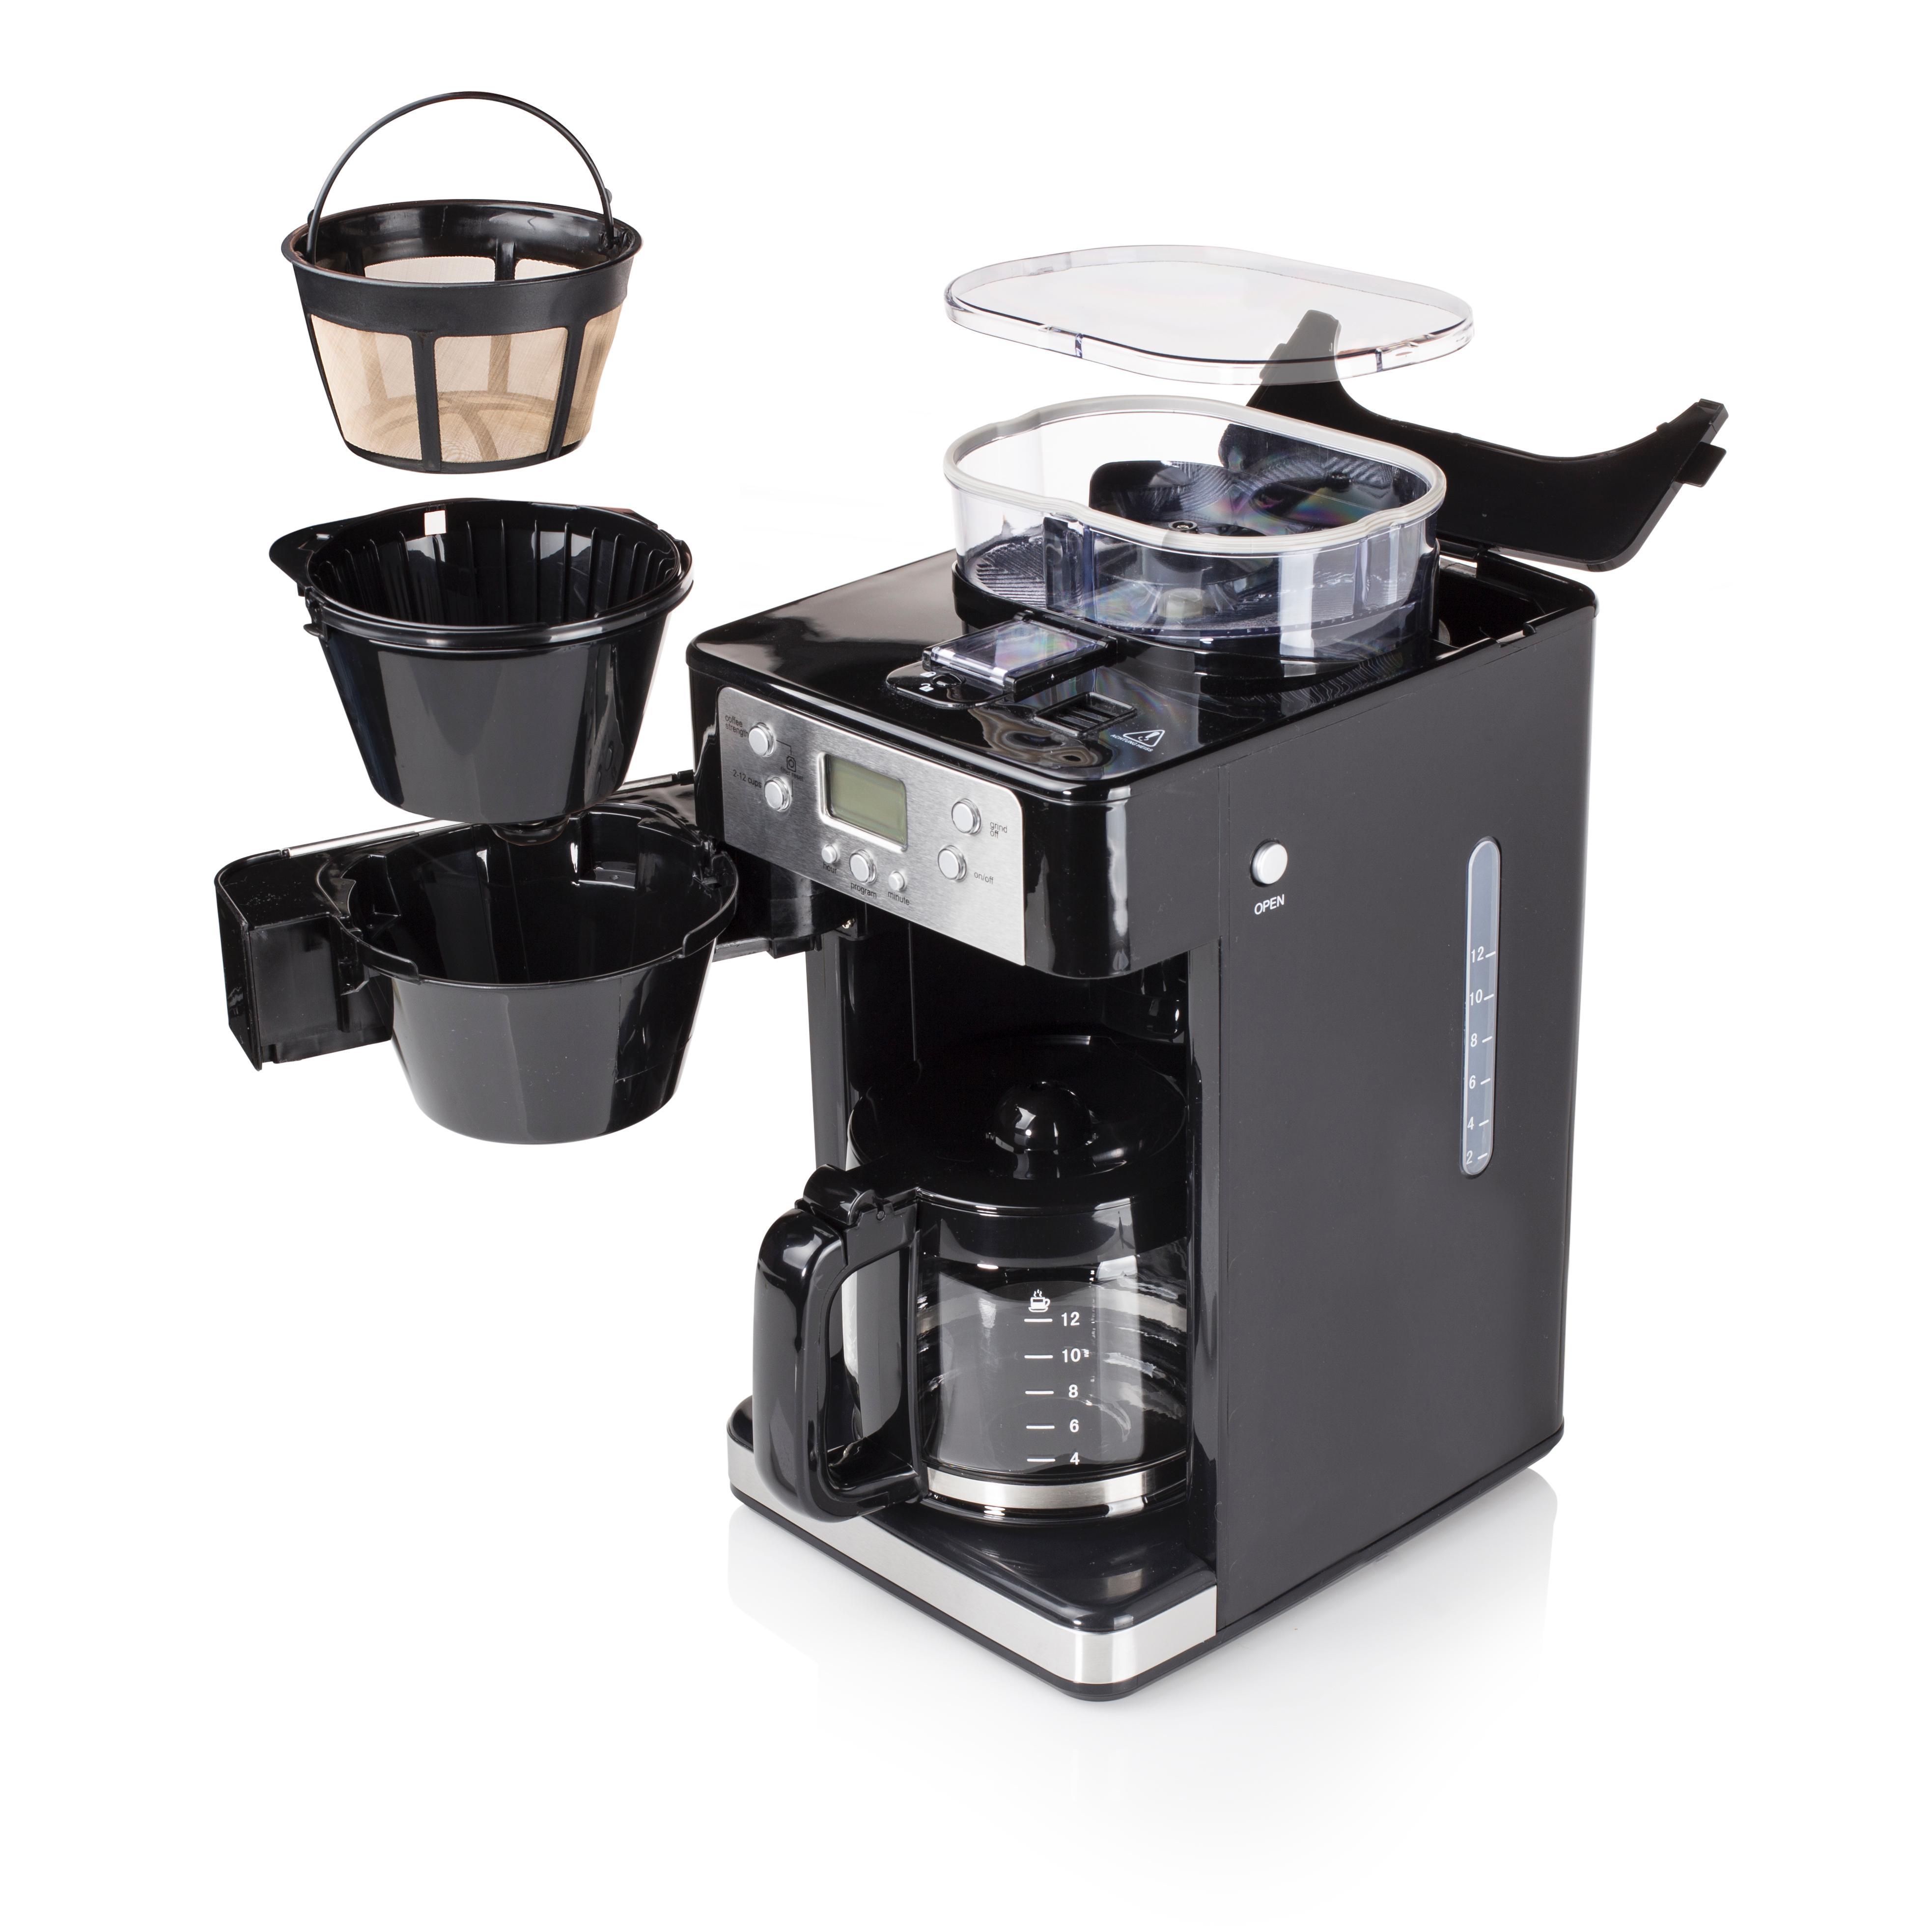 tristar kz 1228 kaffeemaschine mit integrierter kaffeem hle. Black Bedroom Furniture Sets. Home Design Ideas